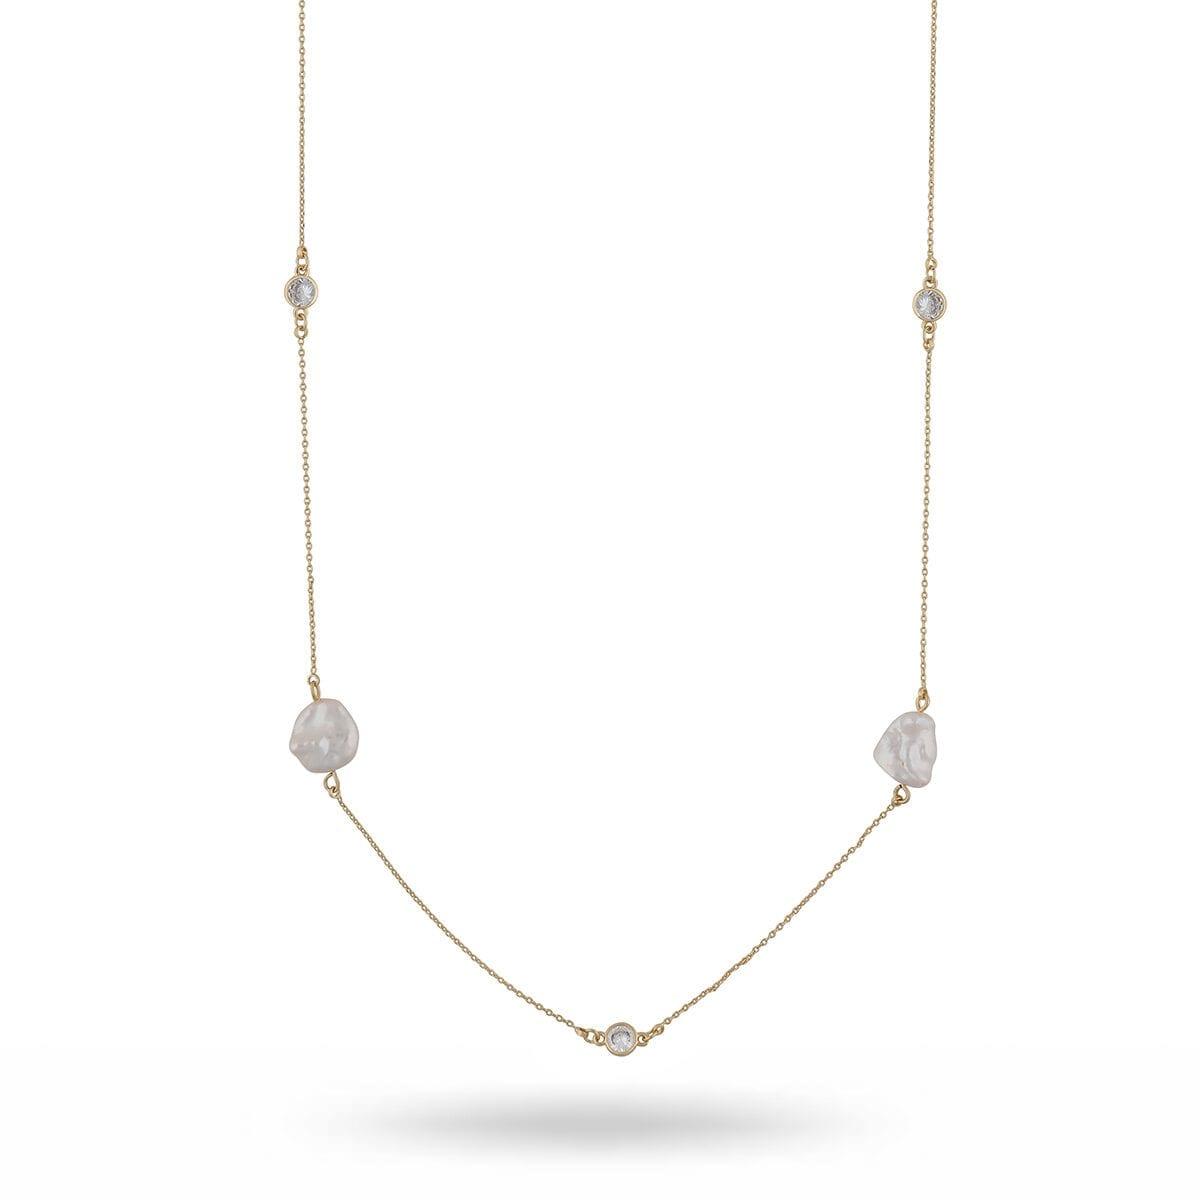 1007-1313362-1-Shape-pearl-chain-neck-100-g-white